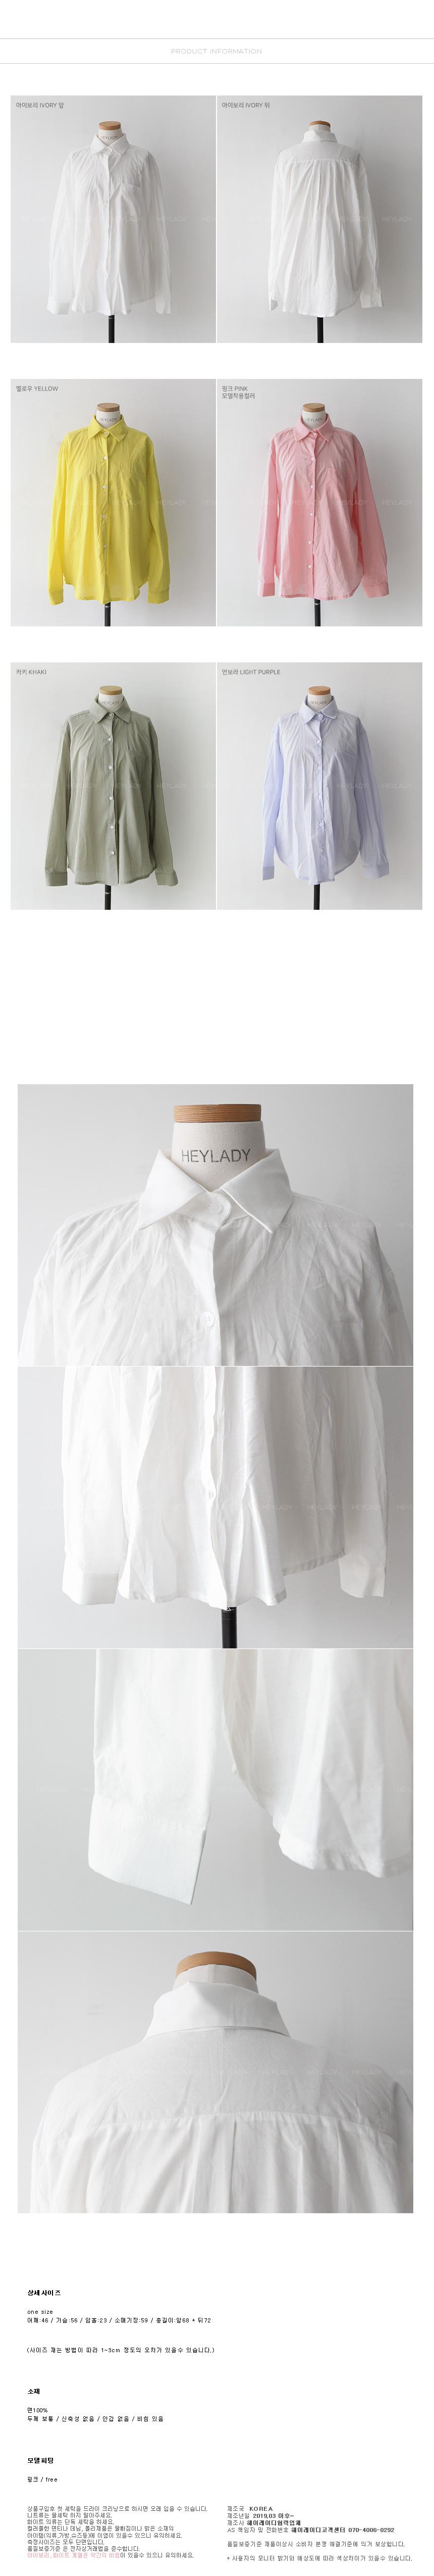 Common Spring Cotton Shirt